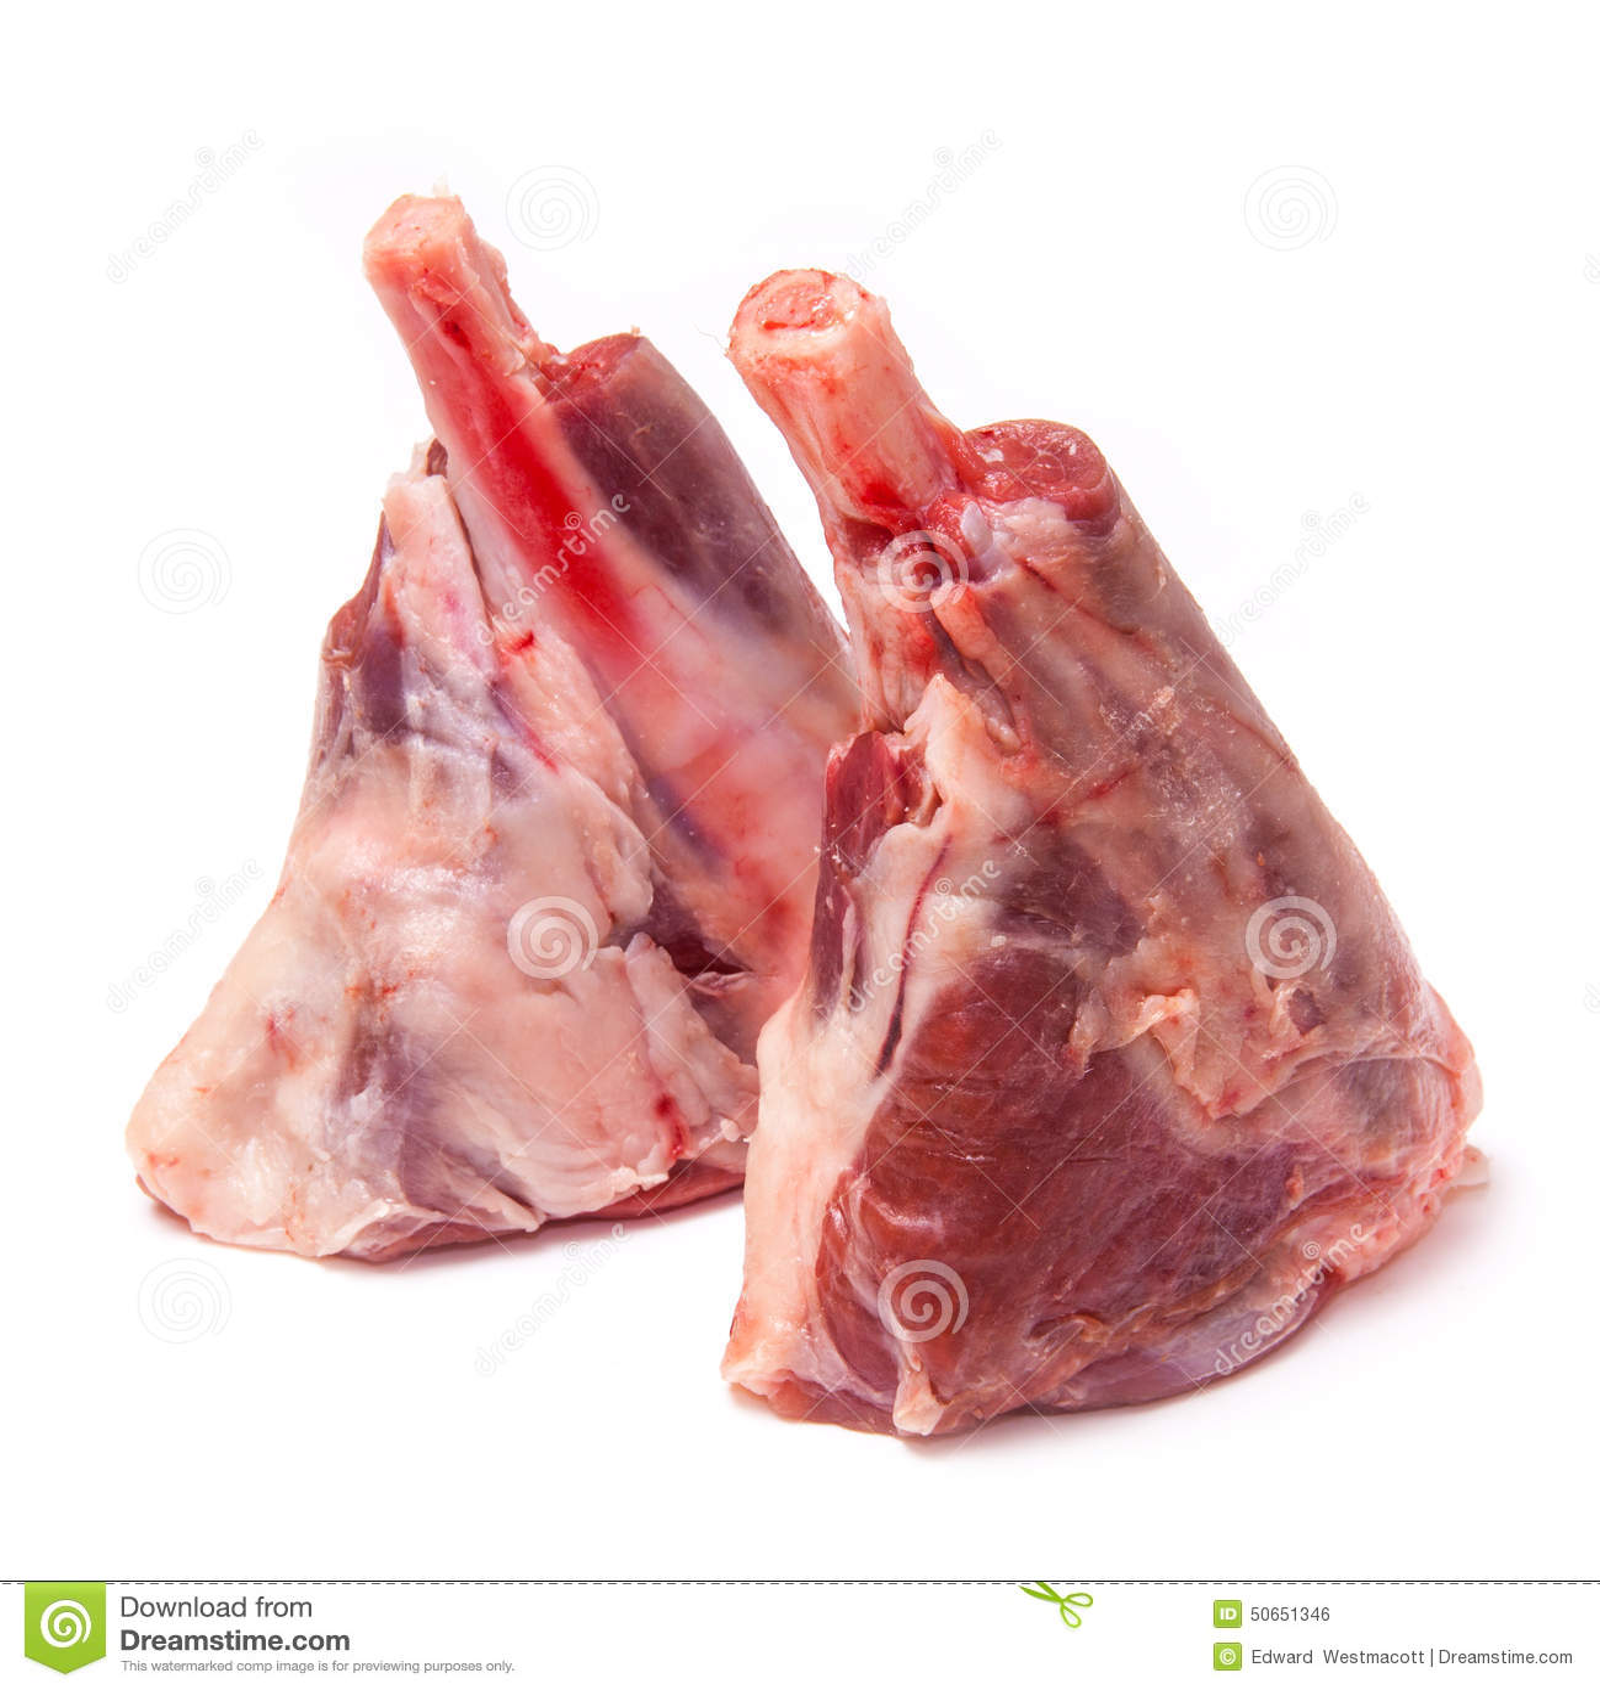 Goat meat shanks